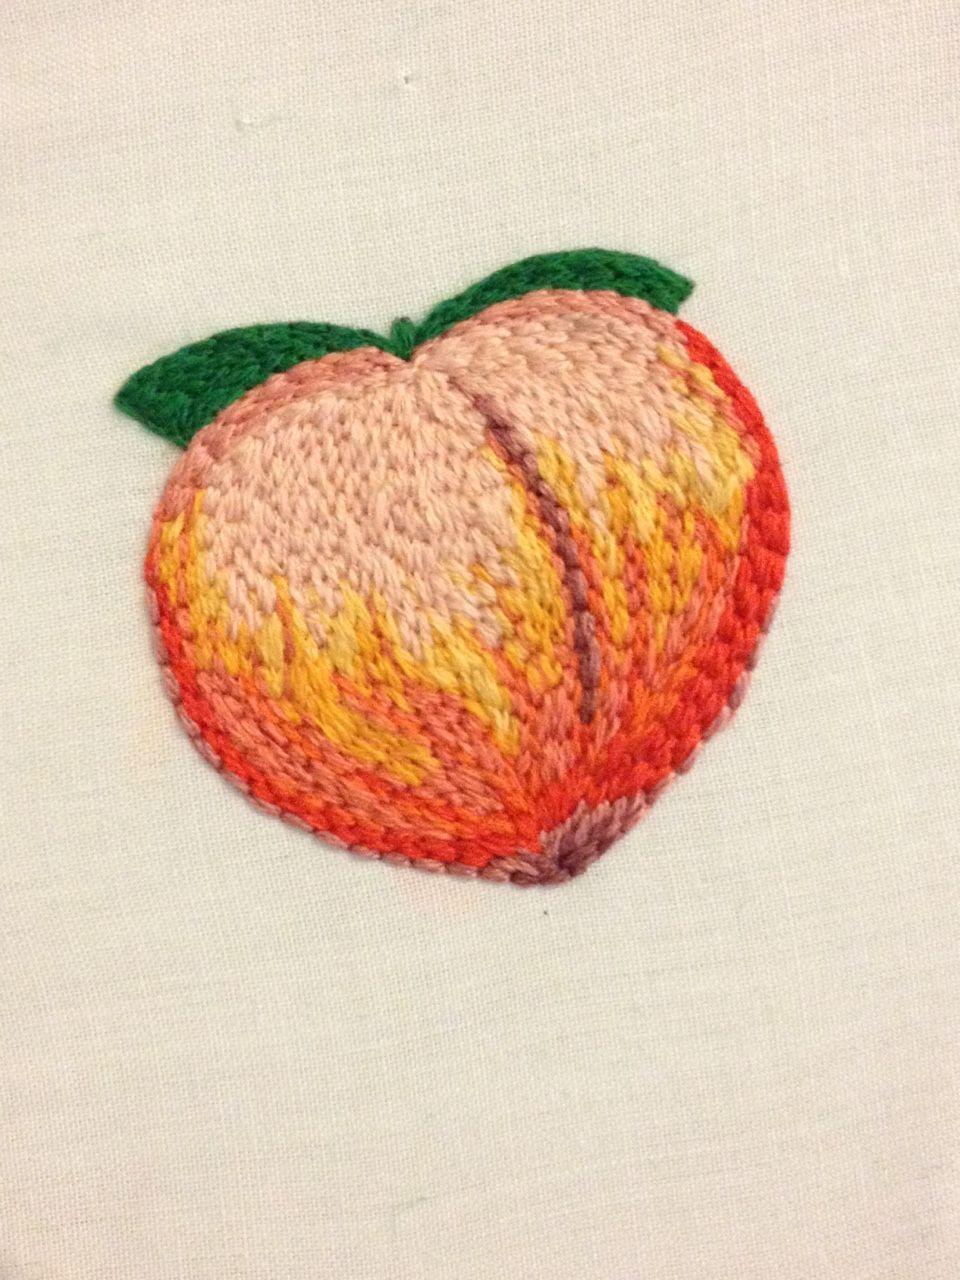 Phoneywallflower Embroidered Peach Emoji Embroidery Pinterest